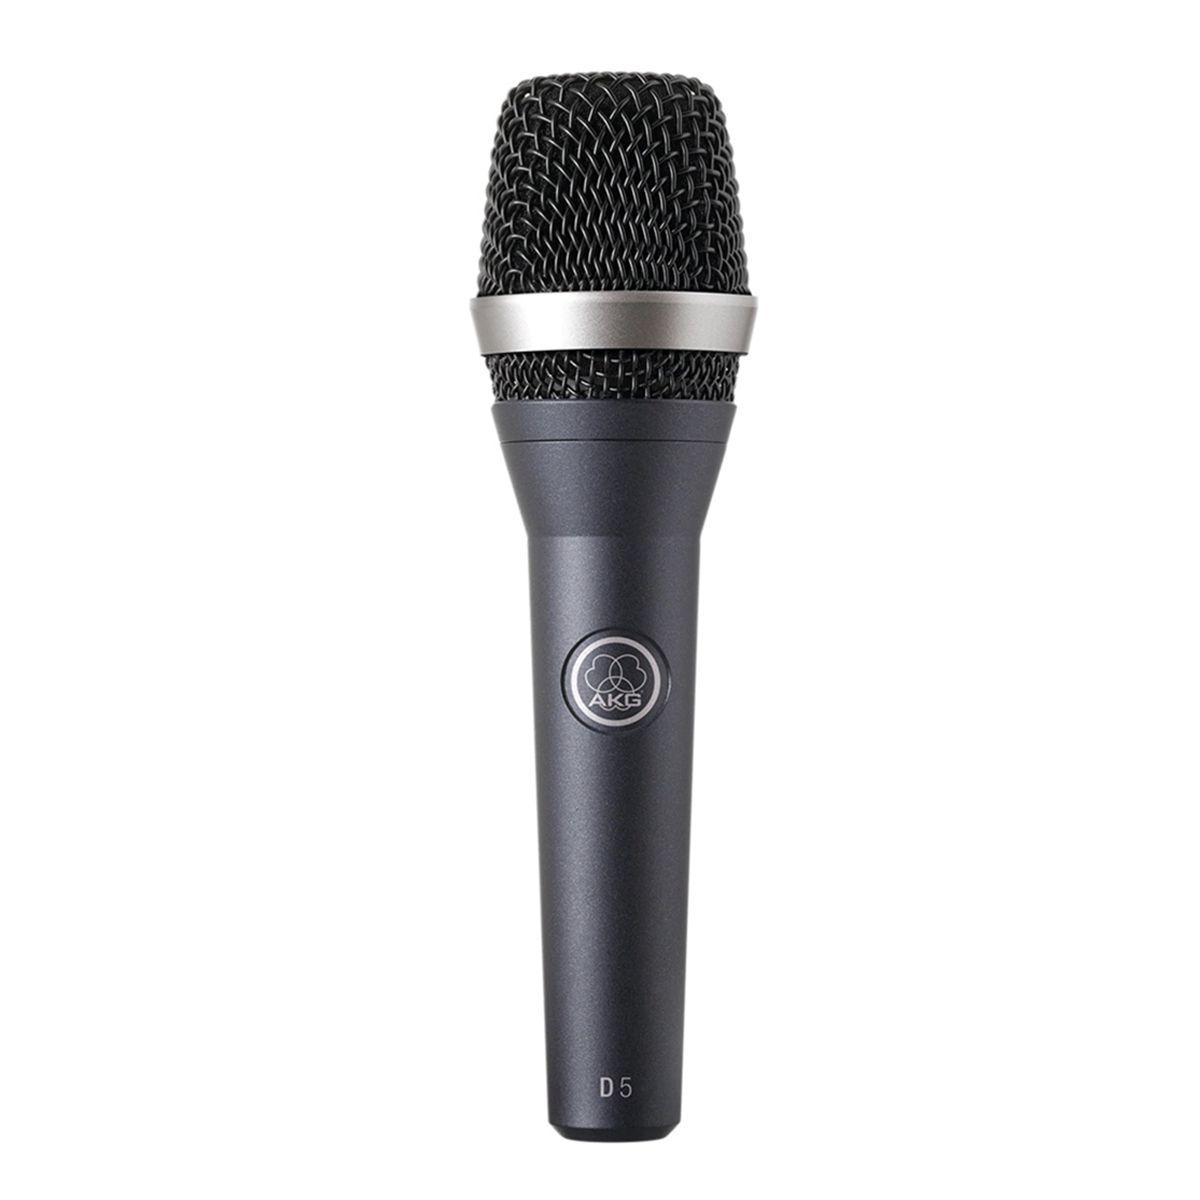 Microfone AKG D5 Dinâmico Supercardioide